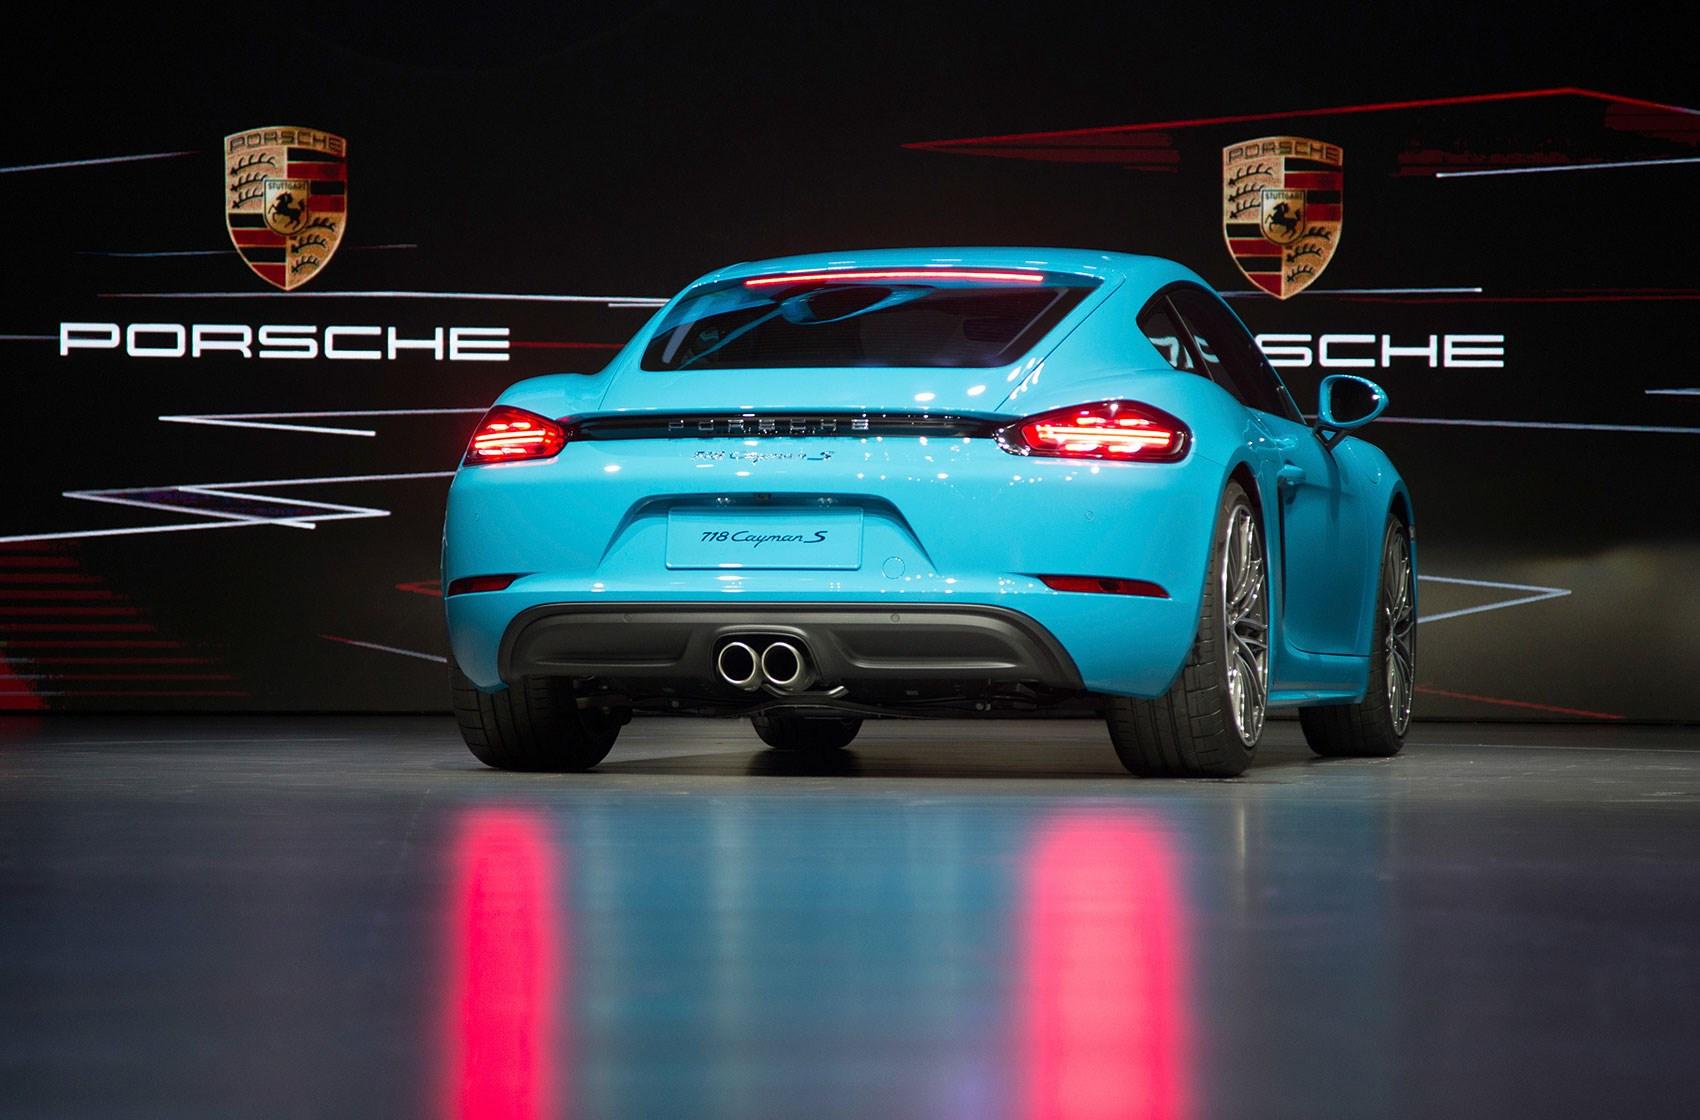 Porsche Boxster Fuse Box Panel Diagram Puts The Boost In New Cayman Revealed Car Magazine Carmagazine 1700x1120